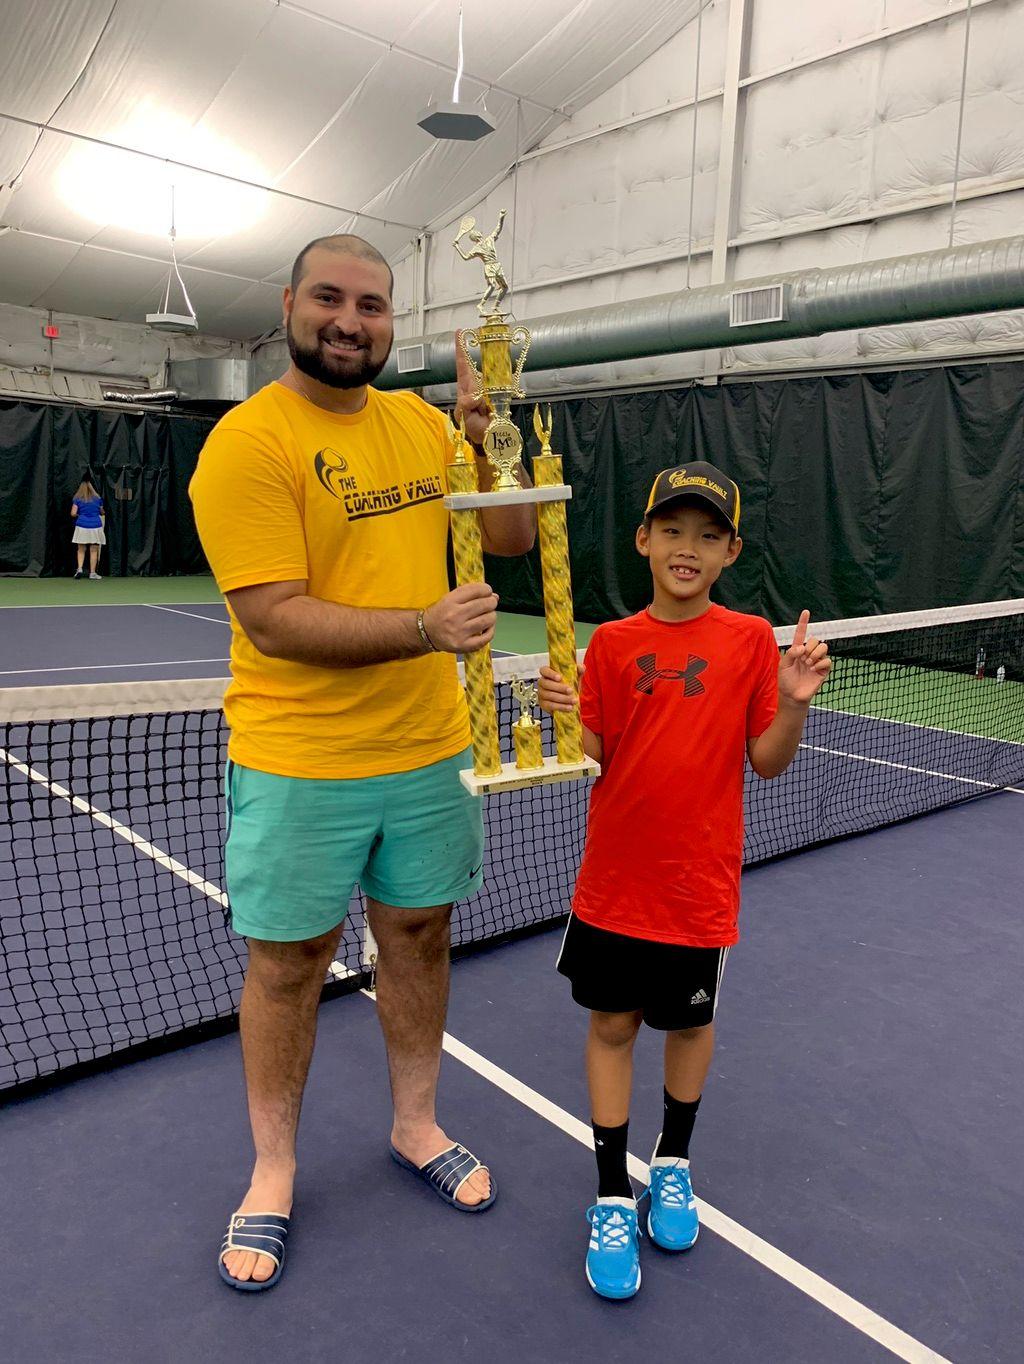 The Coaching Vault (Tennis & Fitness) Academy